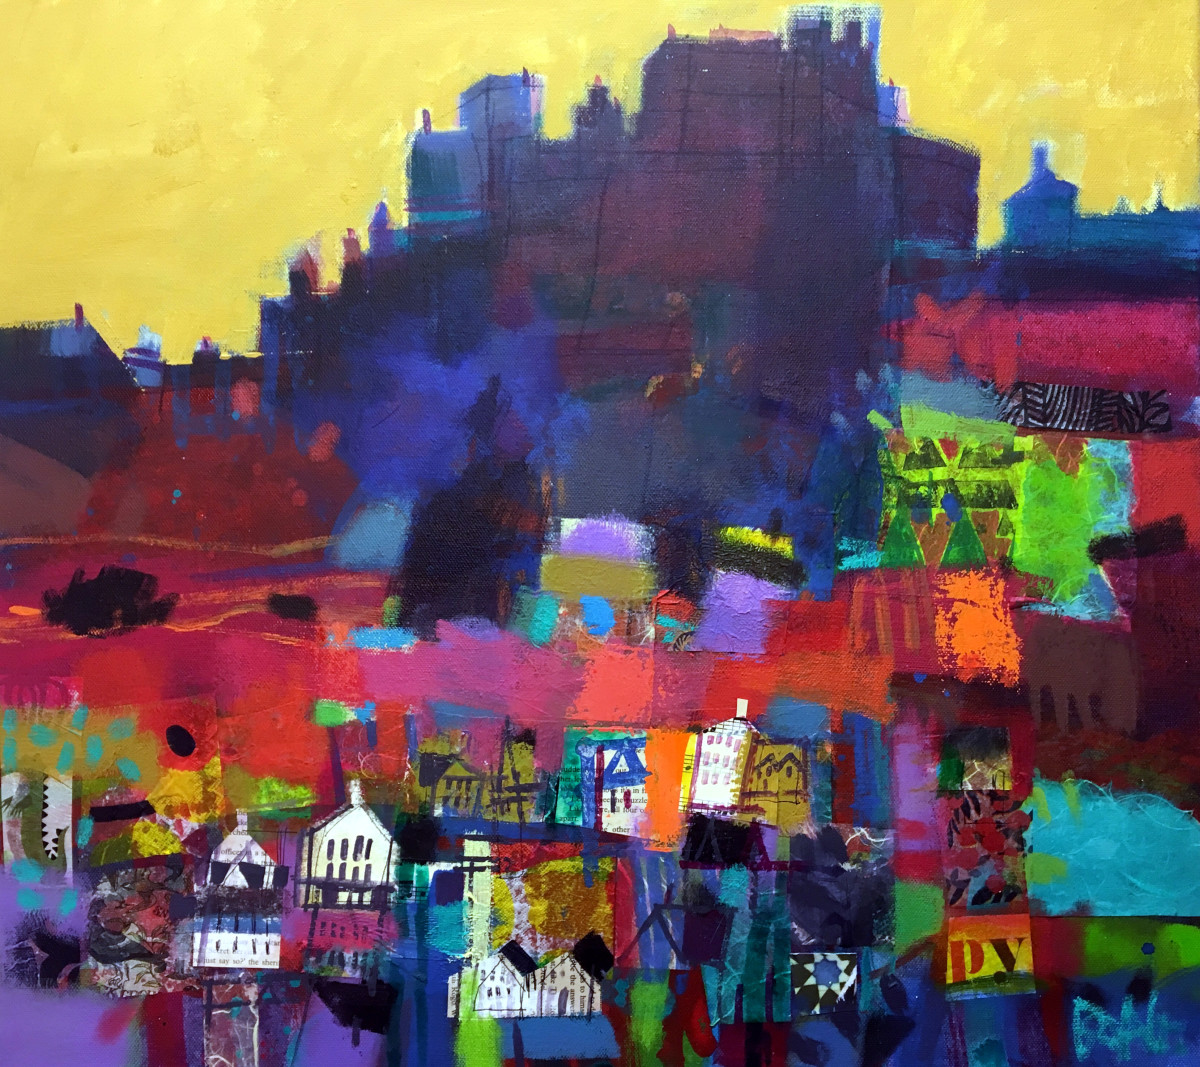 Edinburgh Castle rock by francis boag